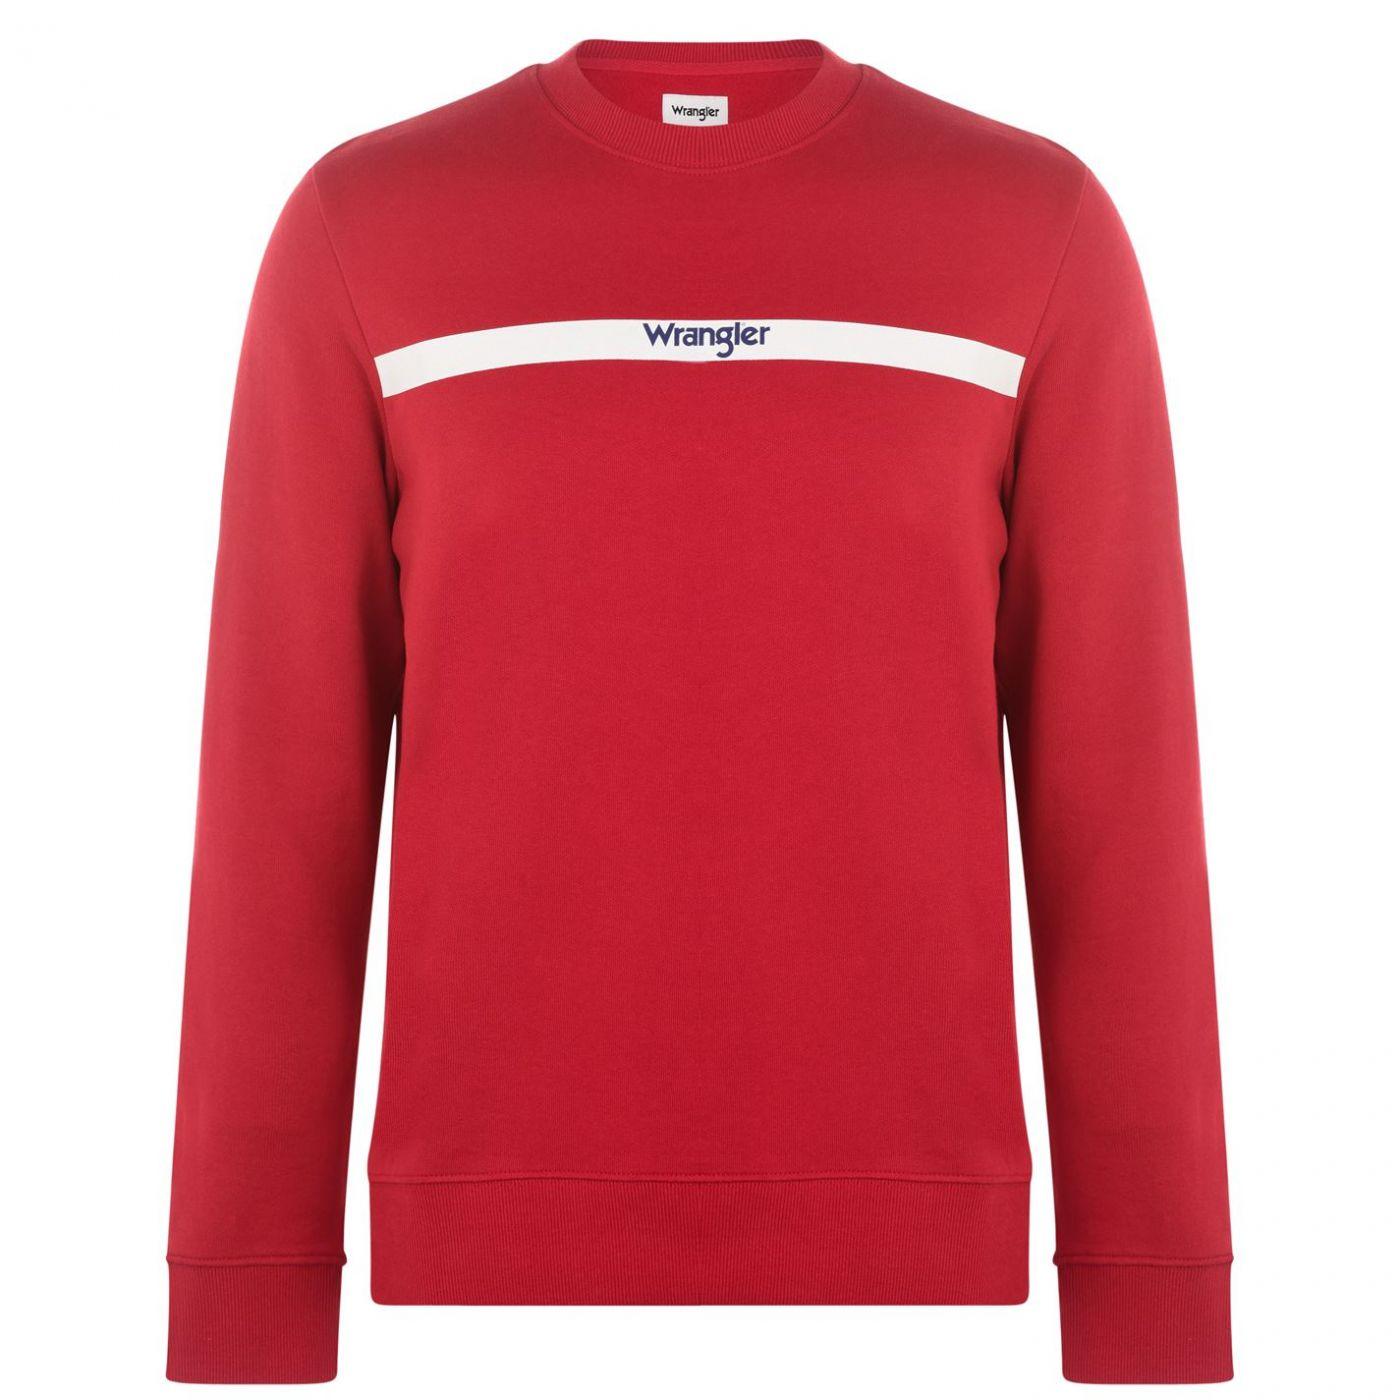 Wrangler Stripe Sweatshirt